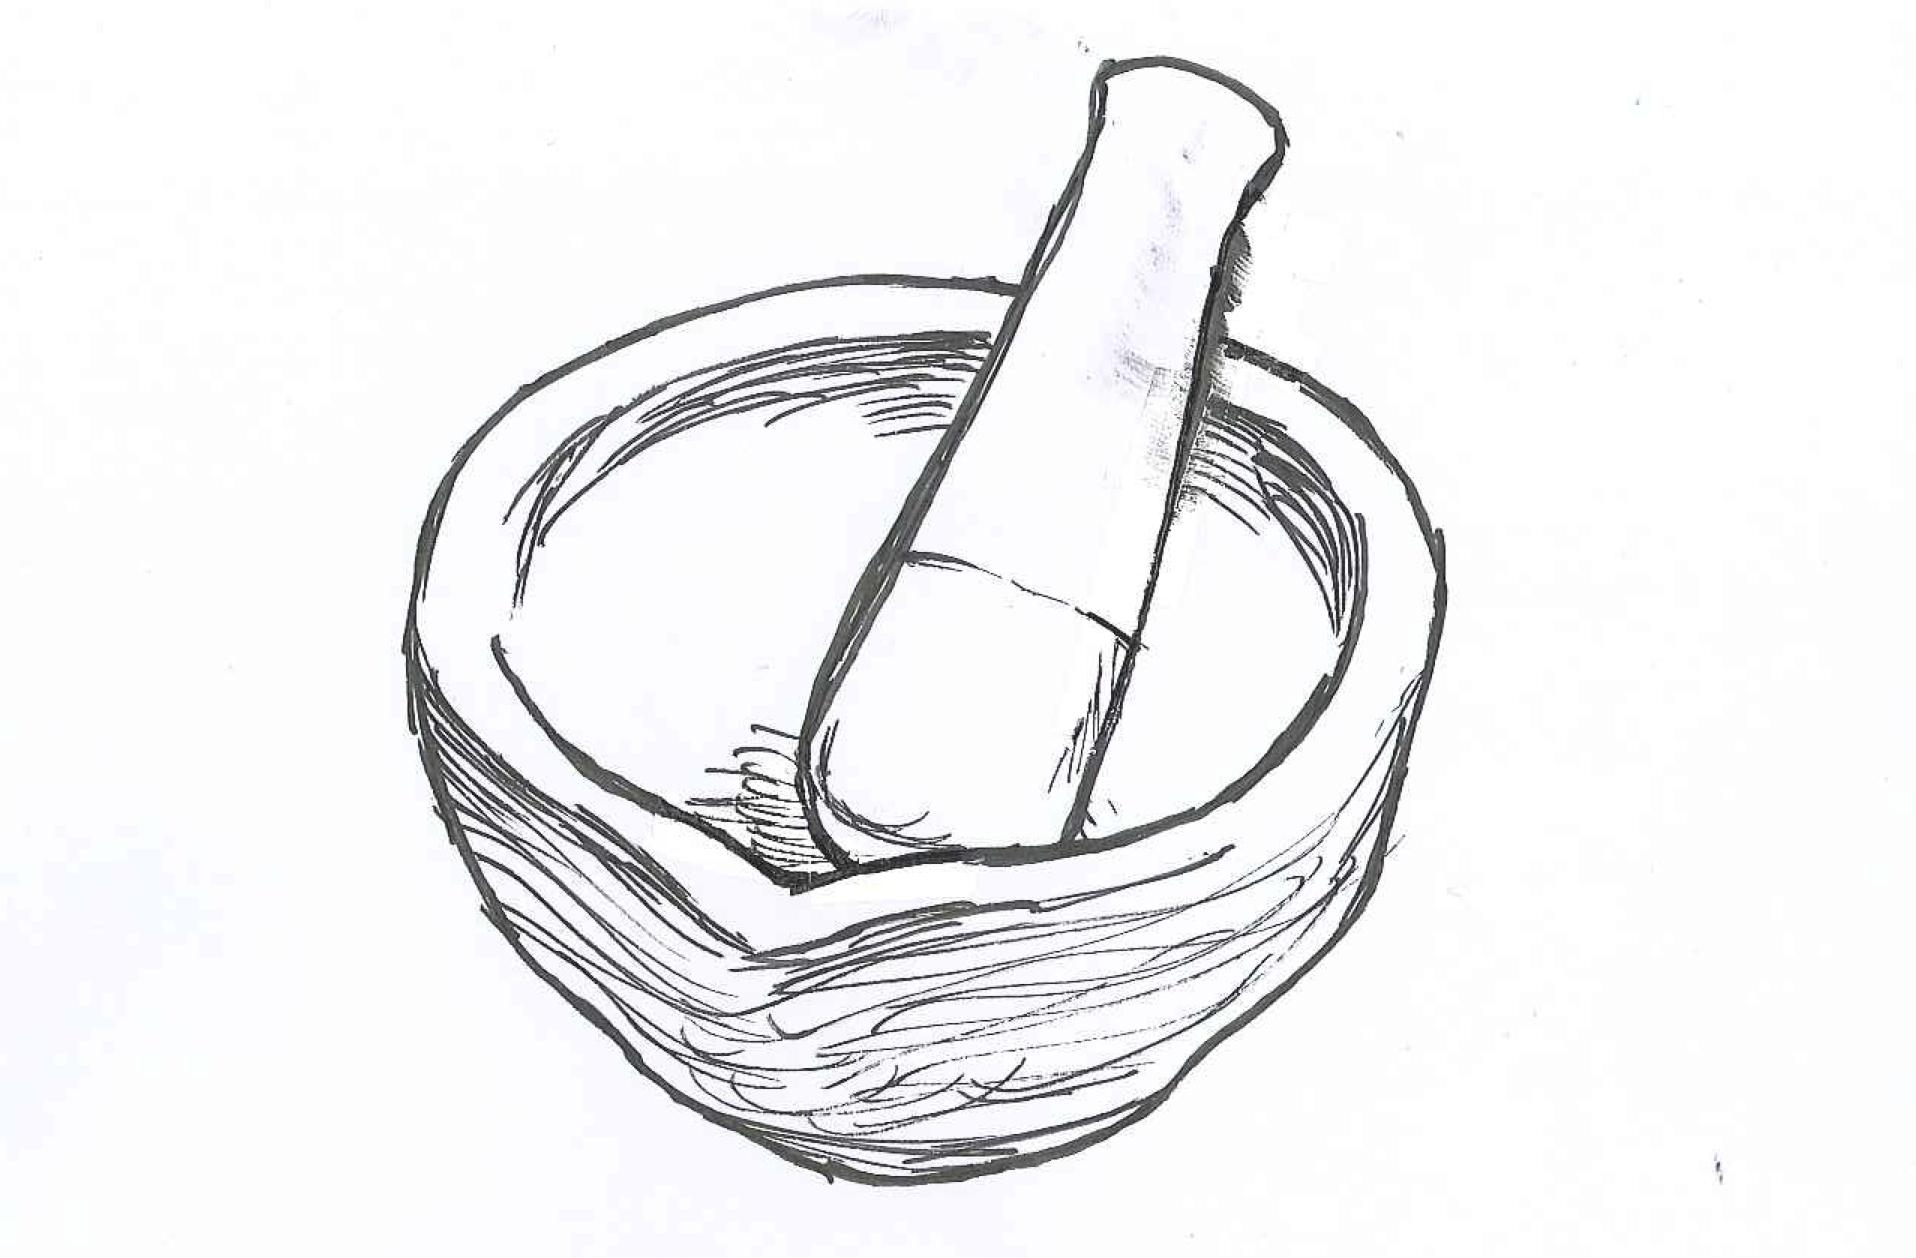 Mortar And Pestle Drawing At Getdrawings